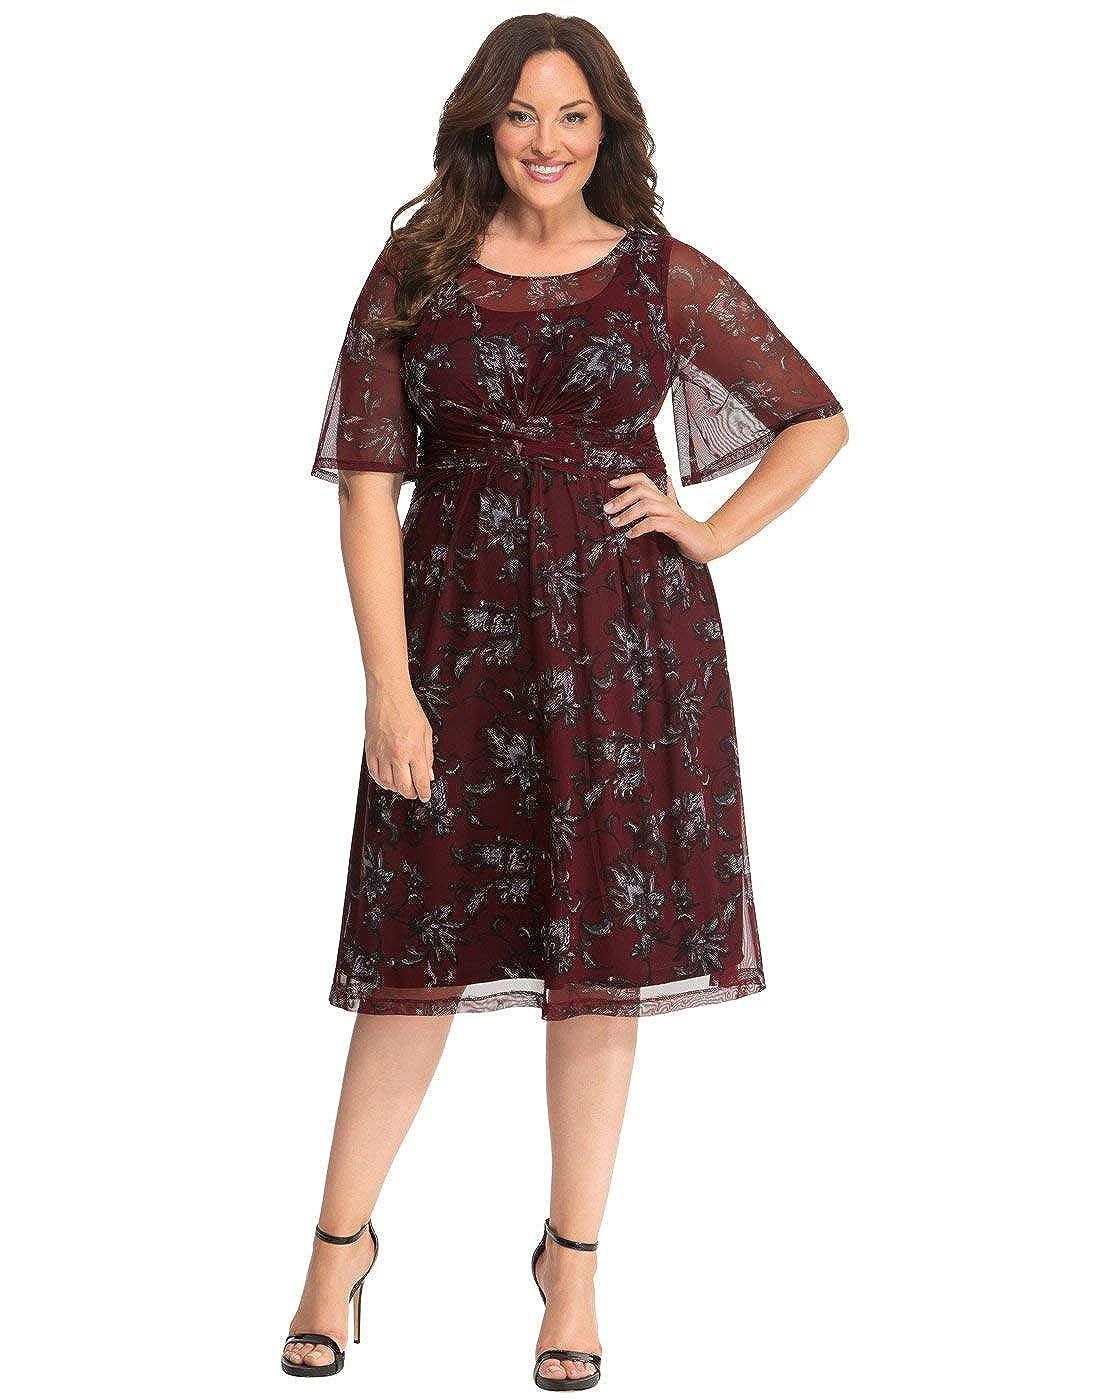 9f866015f05 Kiyonna Women s Plus Size Katarina Mesh Dress at Amazon Women s Clothing  store